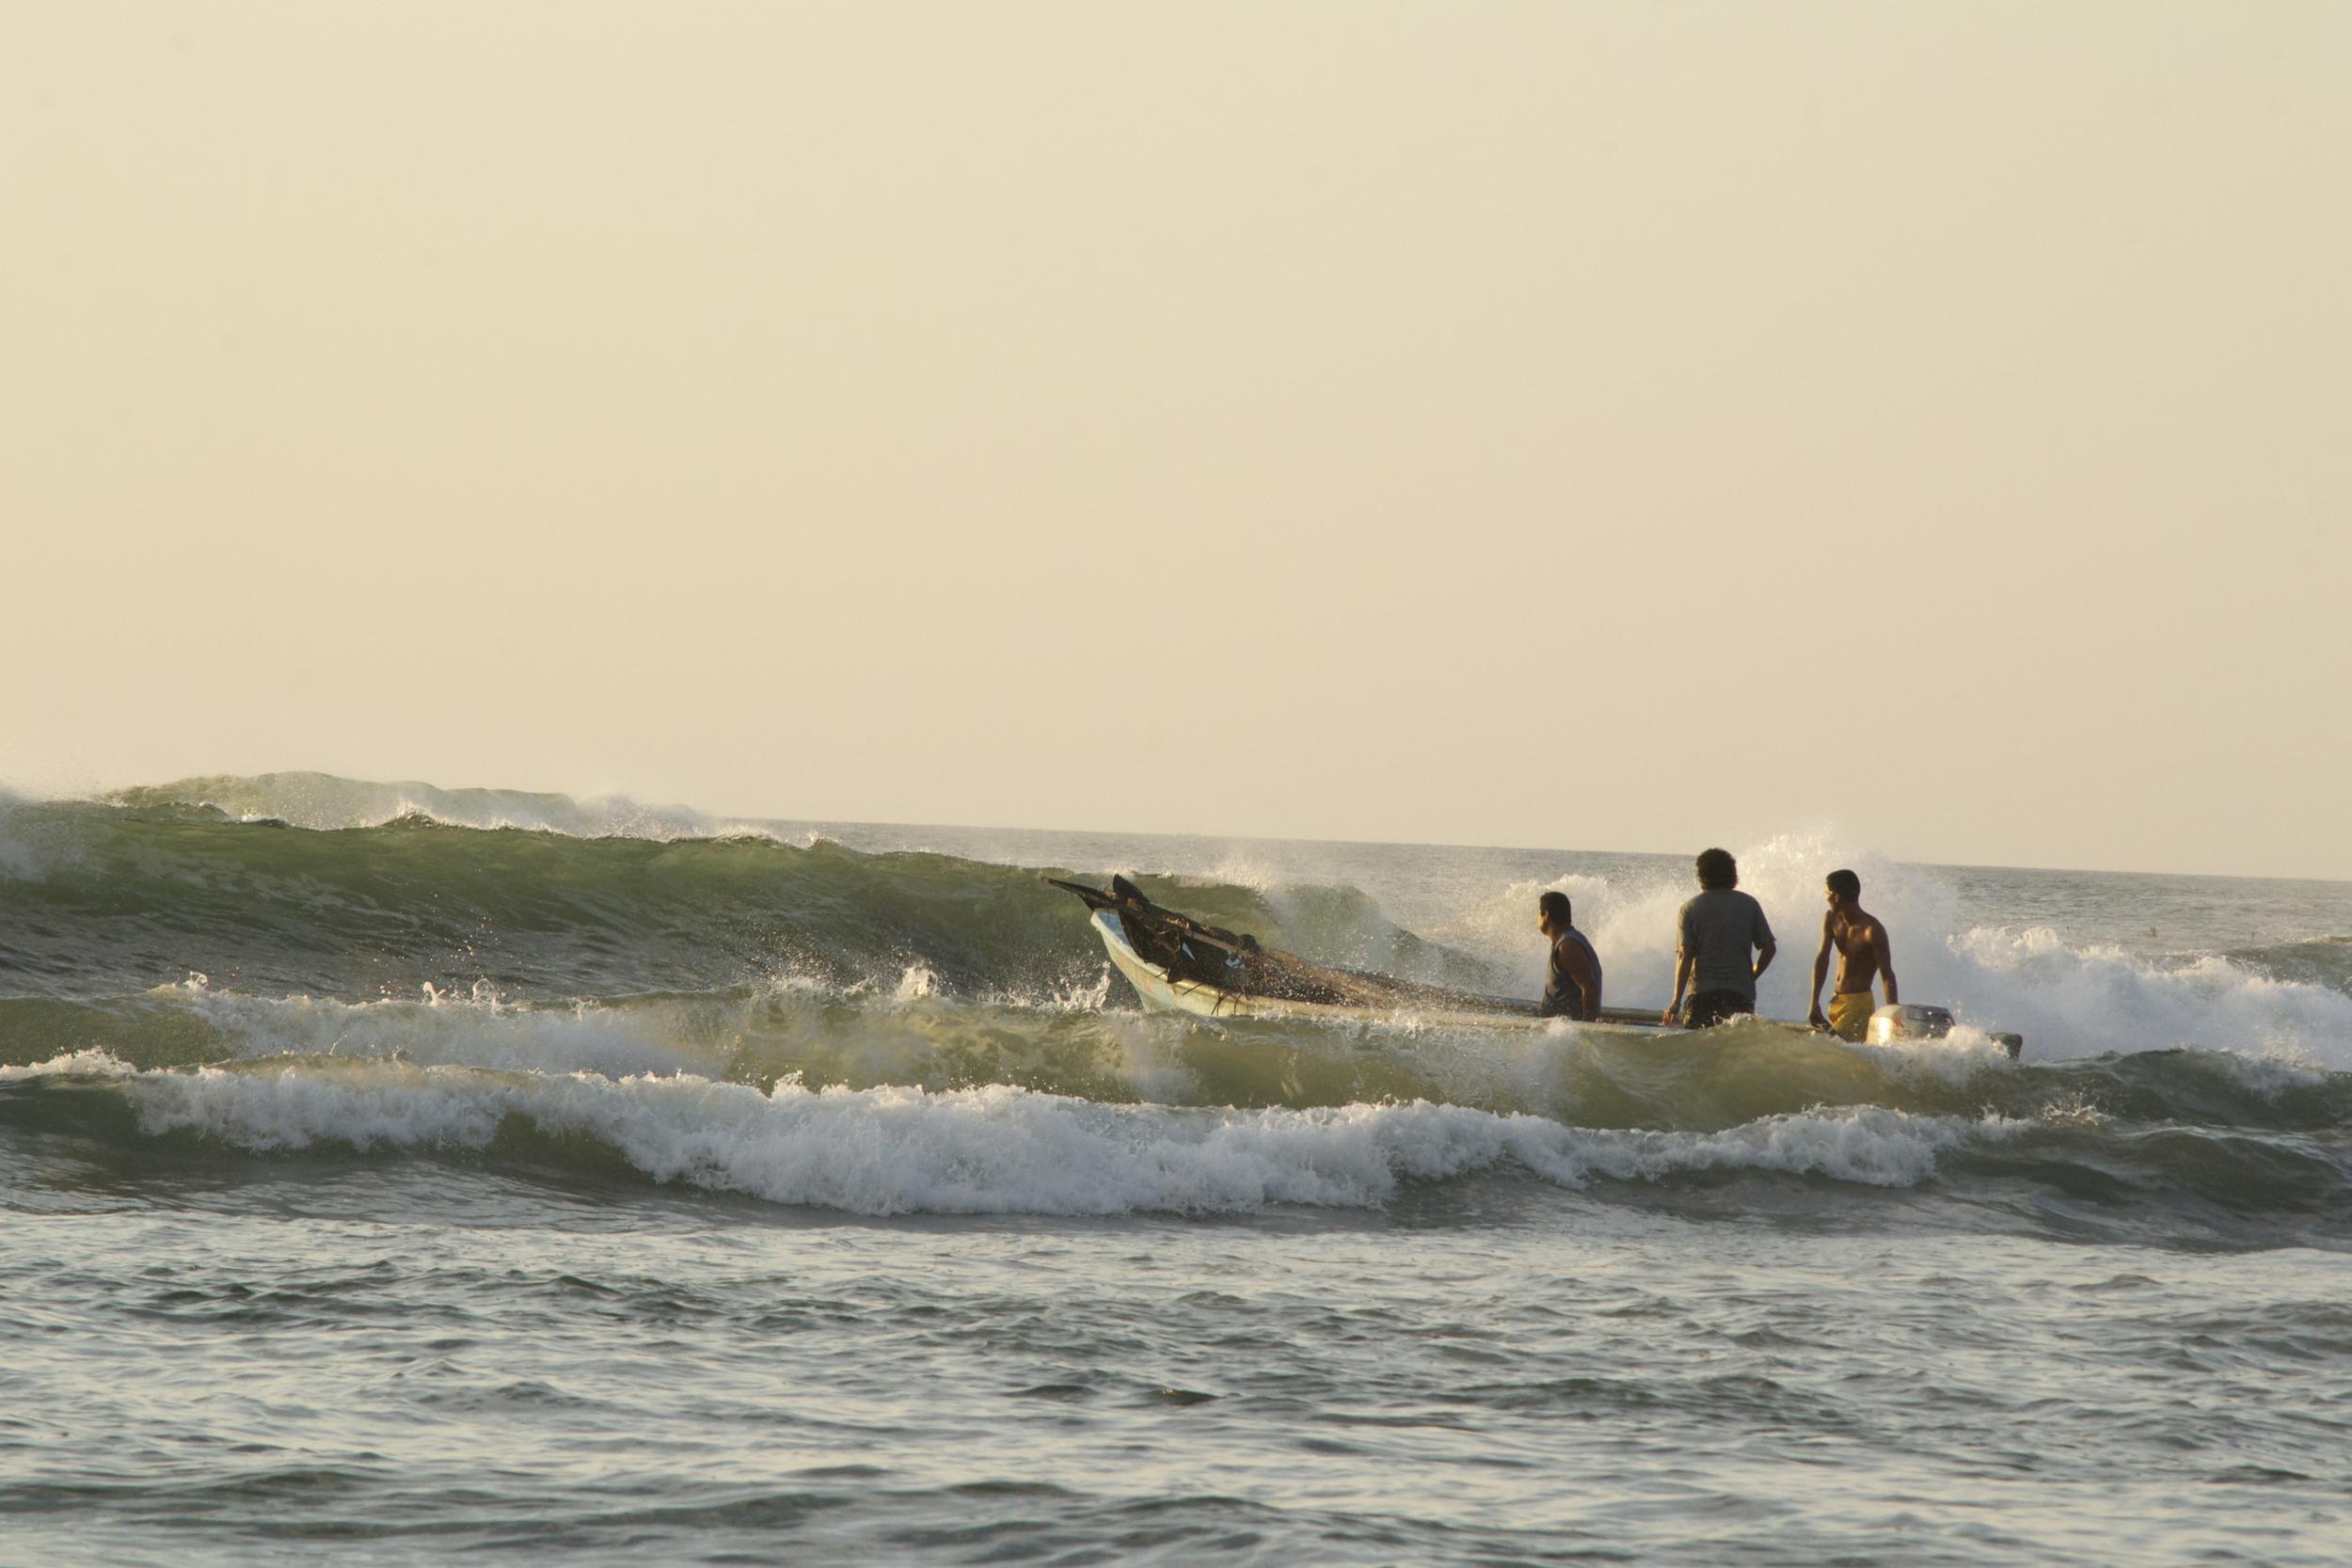 fisher men in waves.jpg